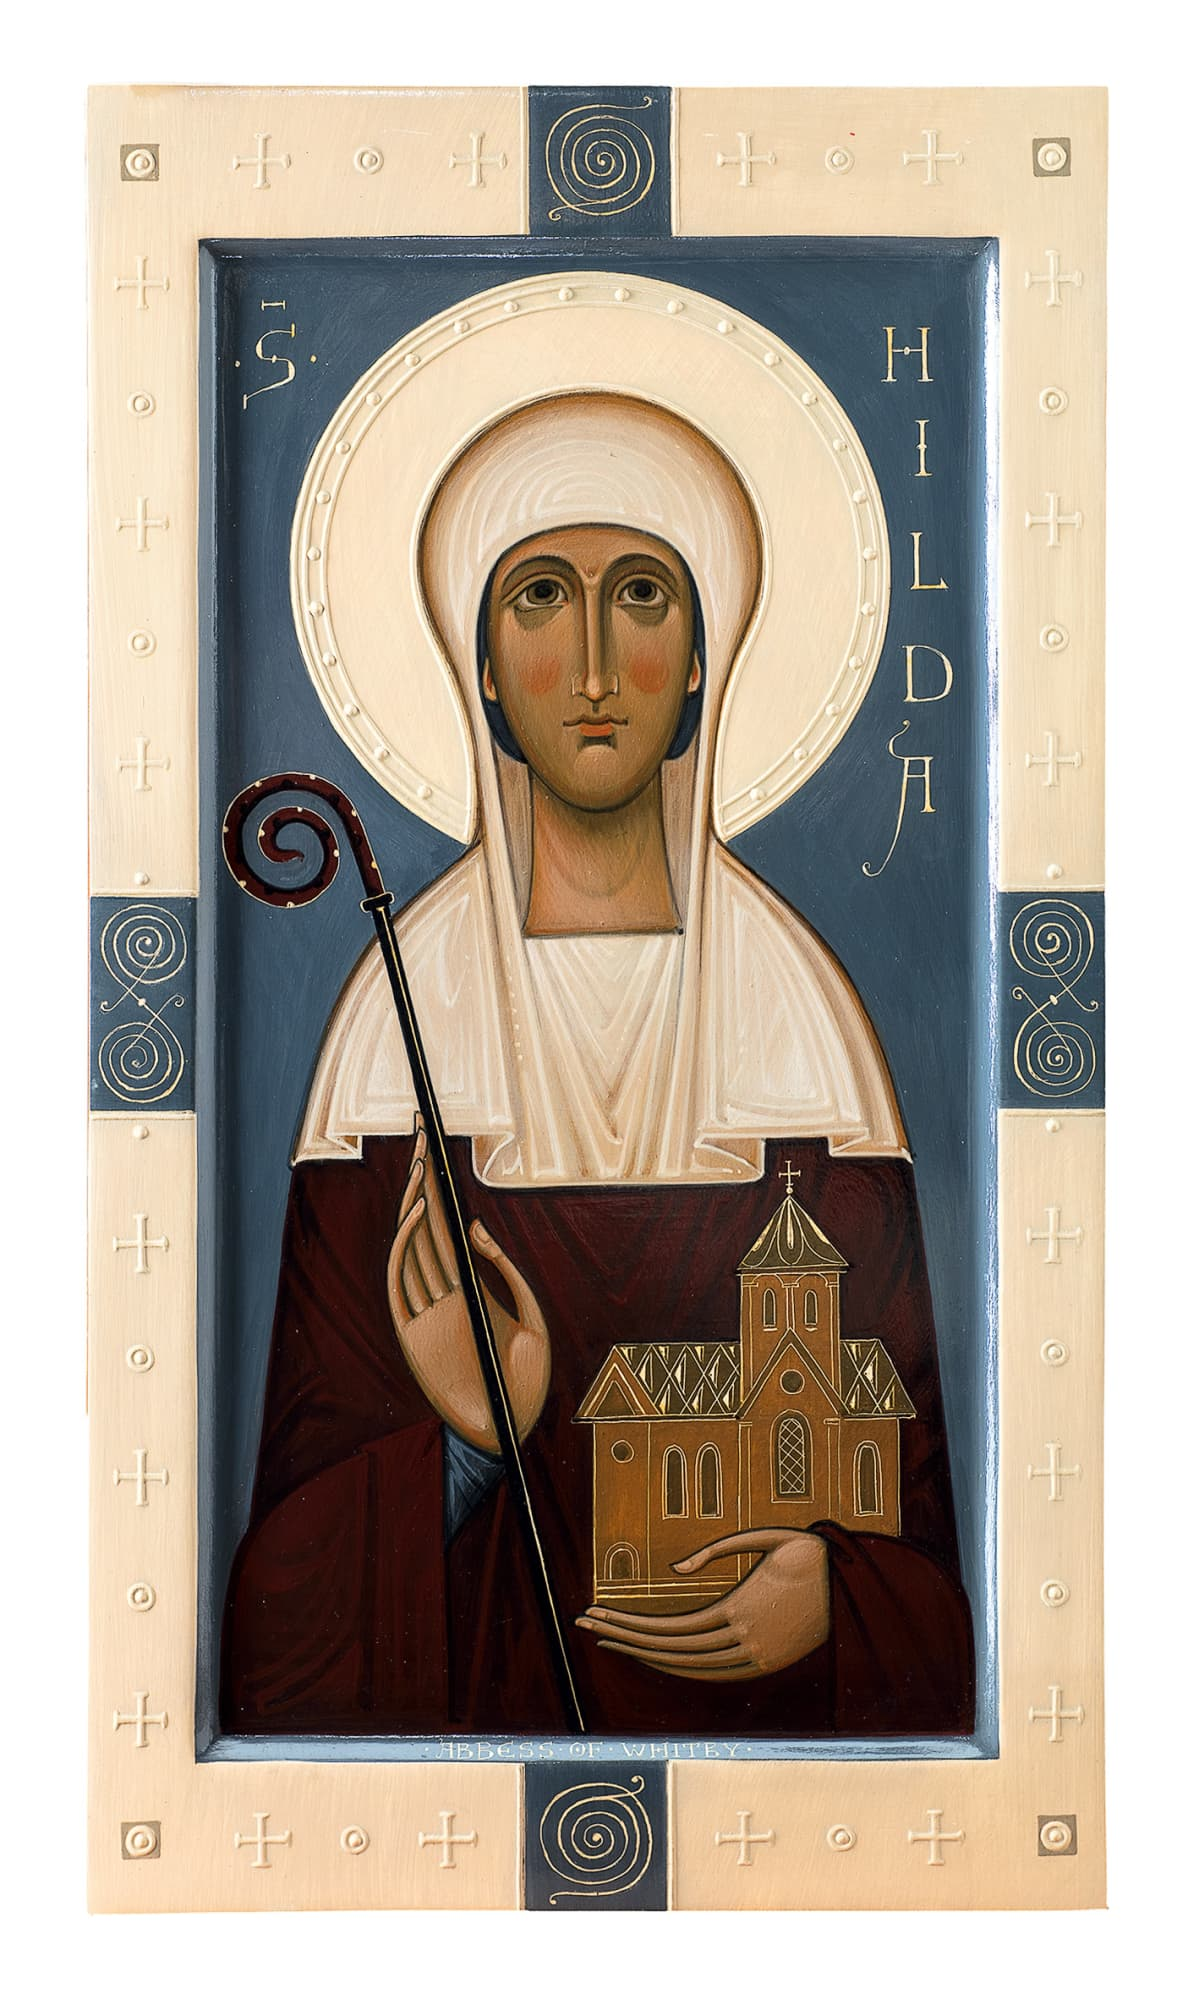 Pyhä Hilda.